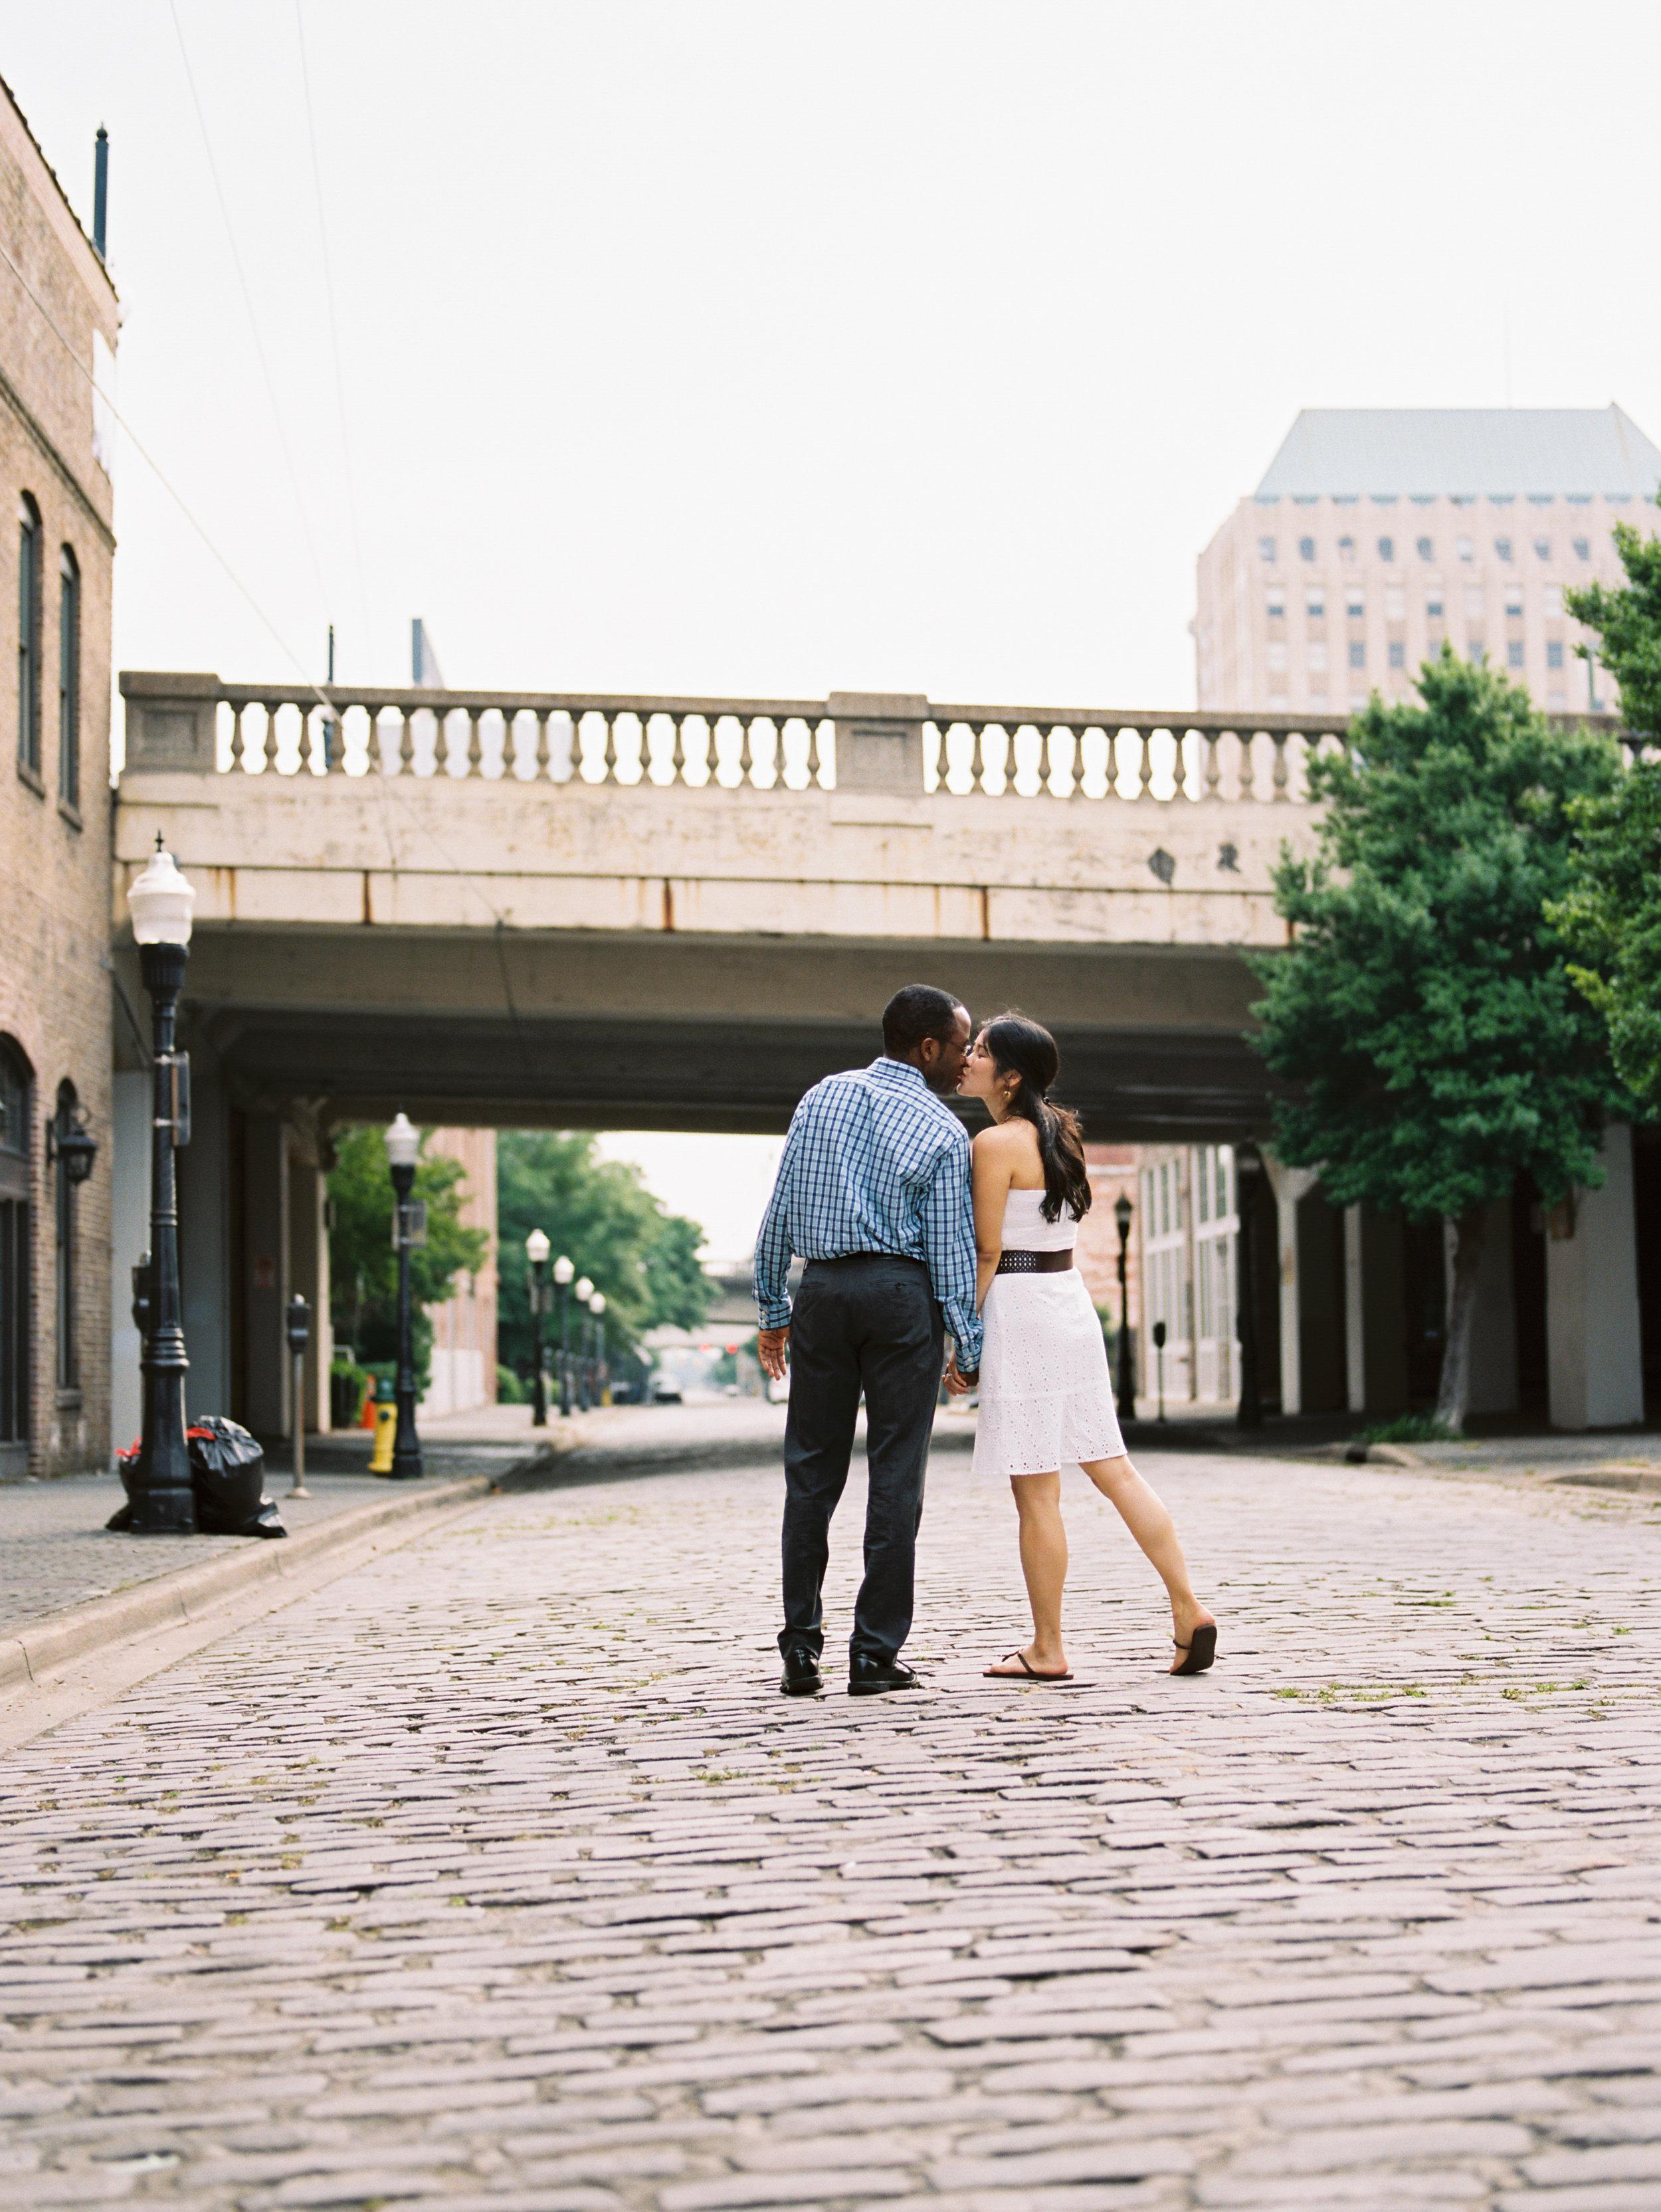 Nick-Drollette-Photography-Downtown Birmingham-Montgomery-102.jpg